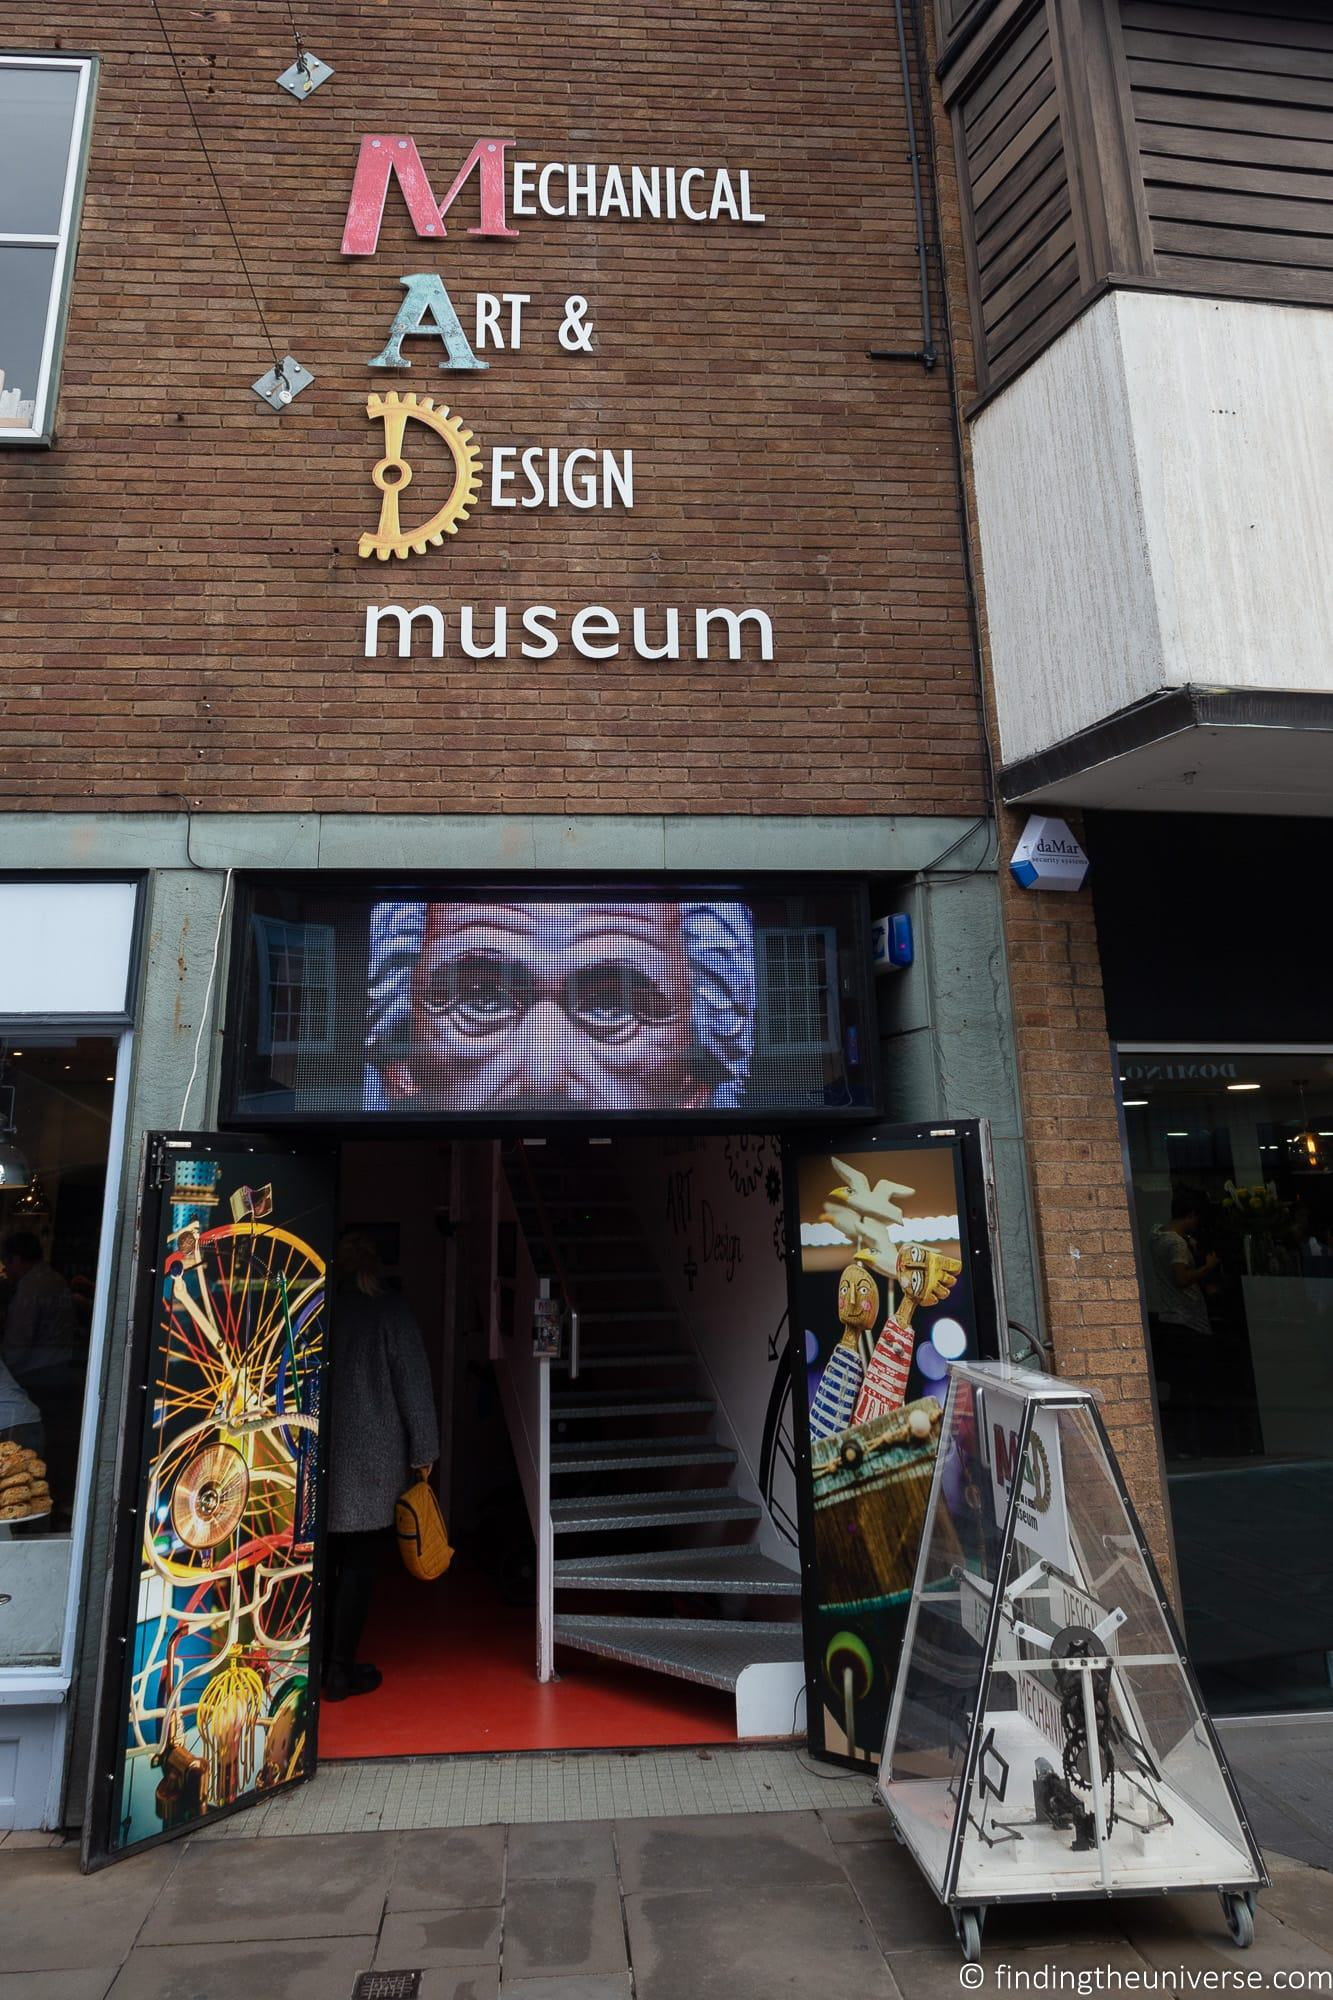 Mechanical Art and Design museum